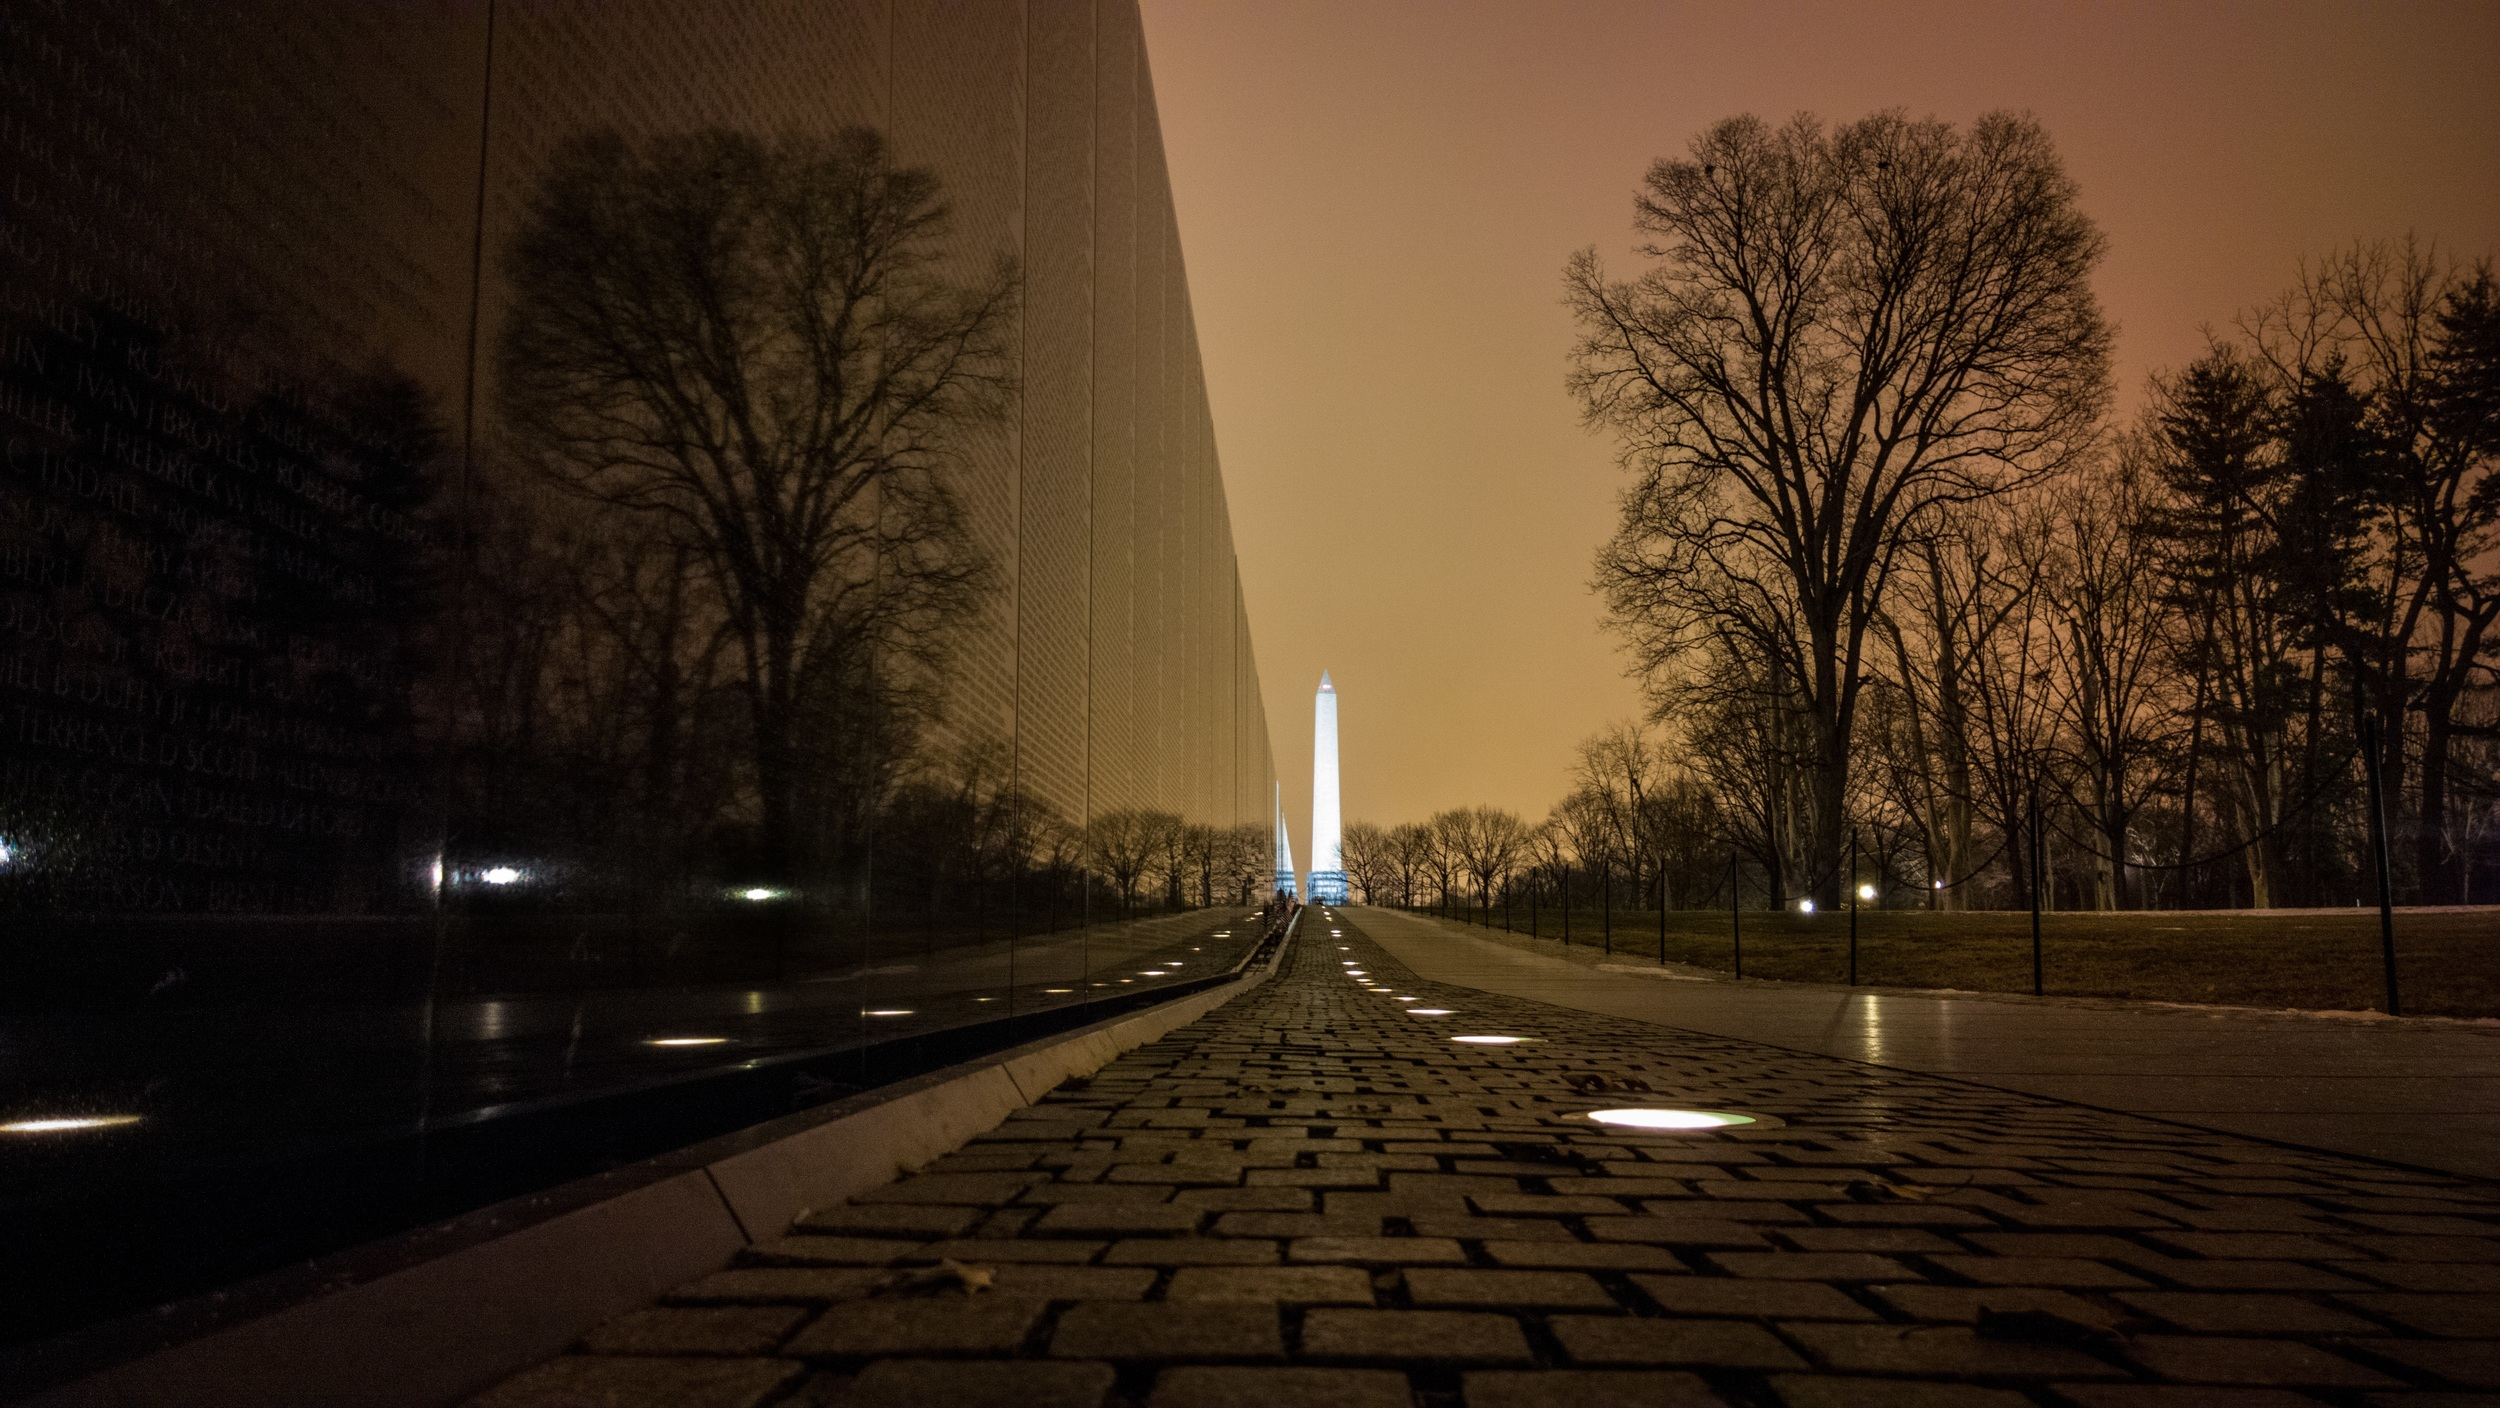 Washington and Vietnam Monuments, Washington, DC